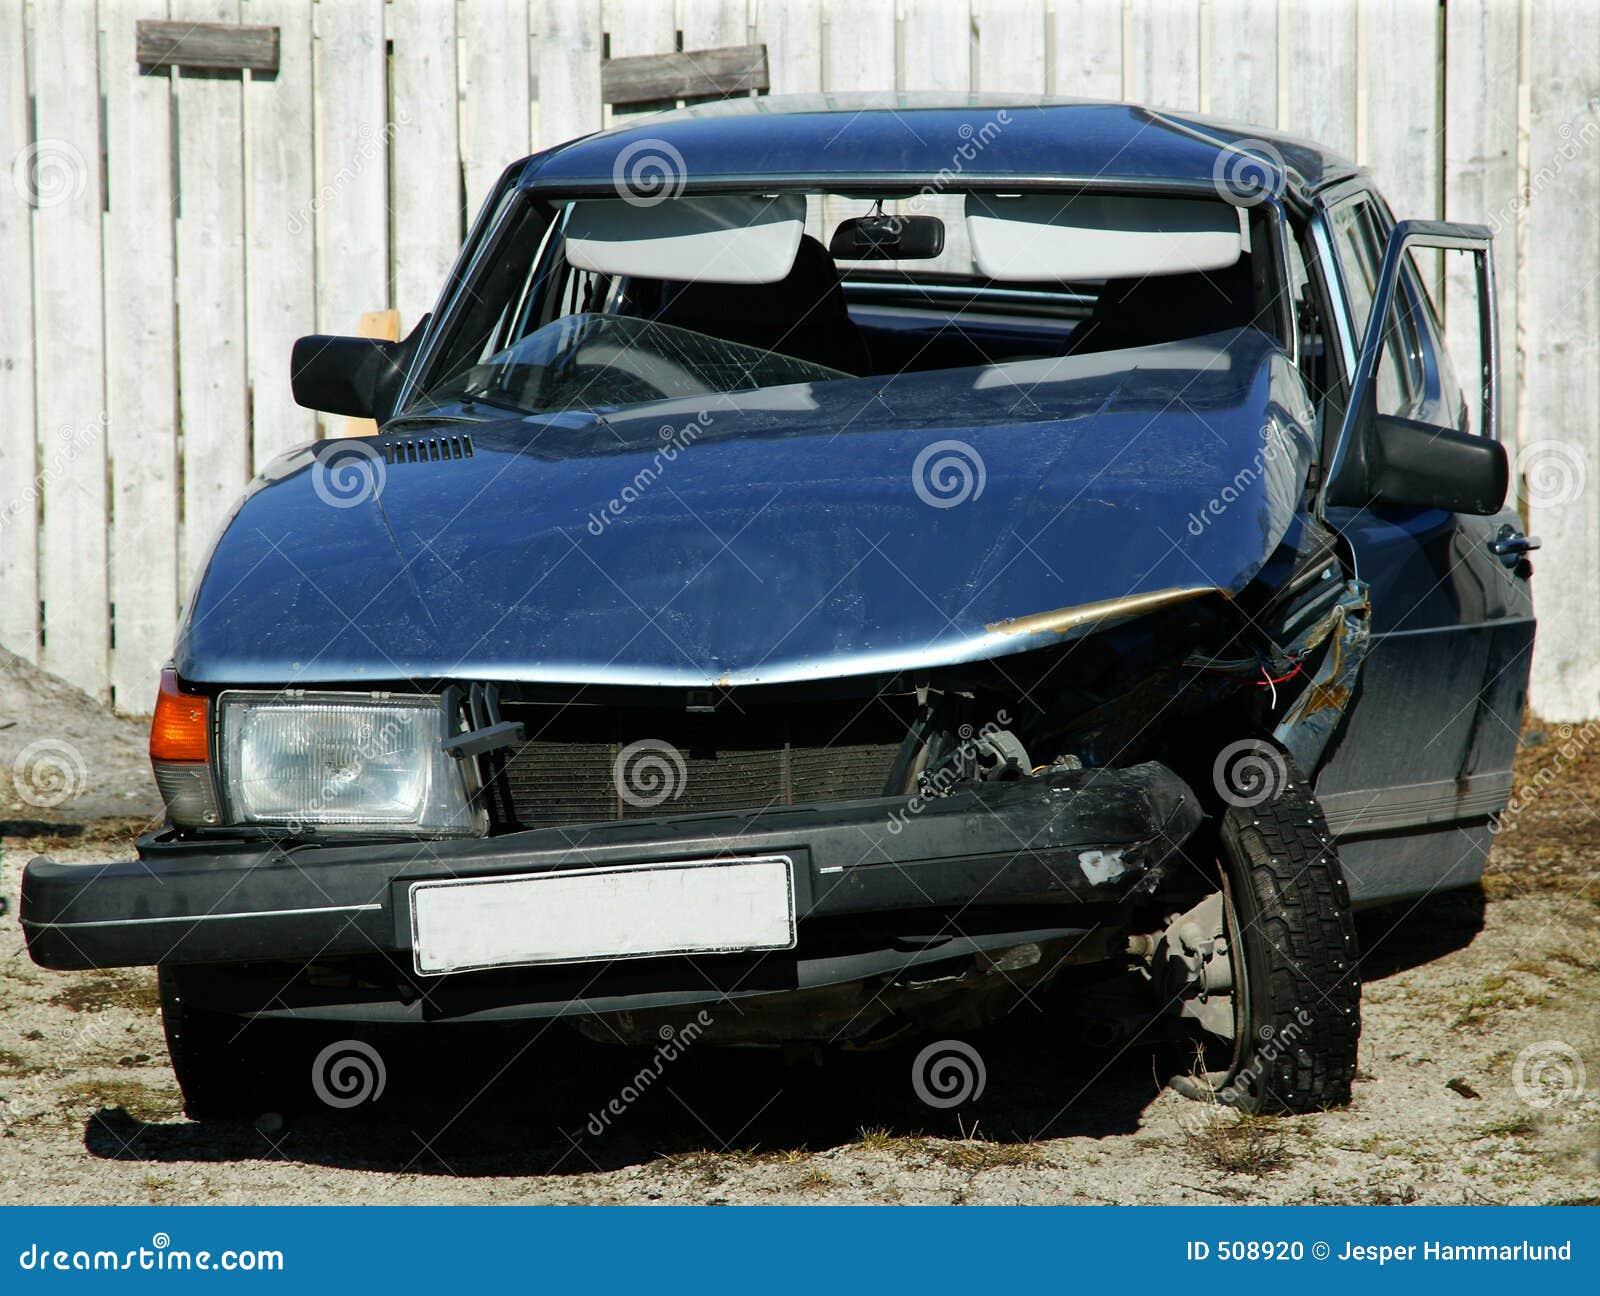 Carcrash 001